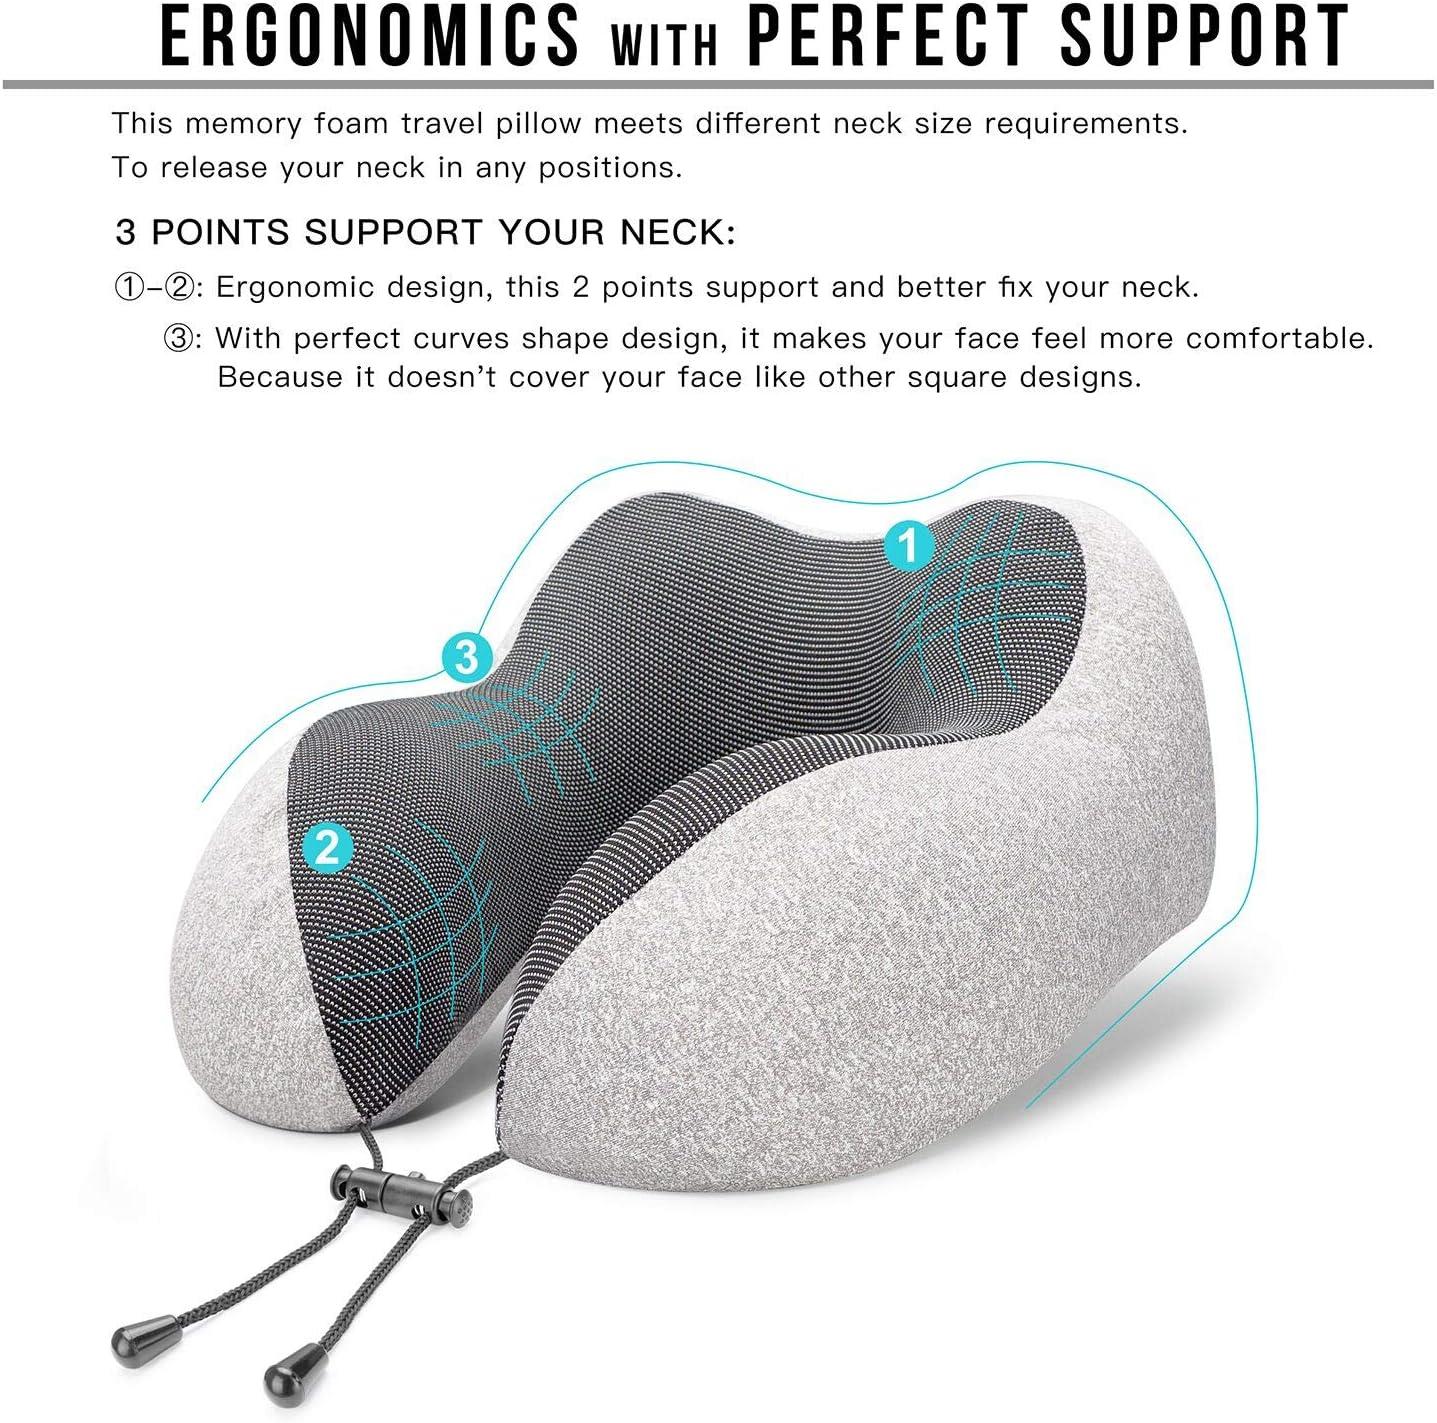 MLVOC Travel Pillow 100% Pure Memory Foam Neck Pillow